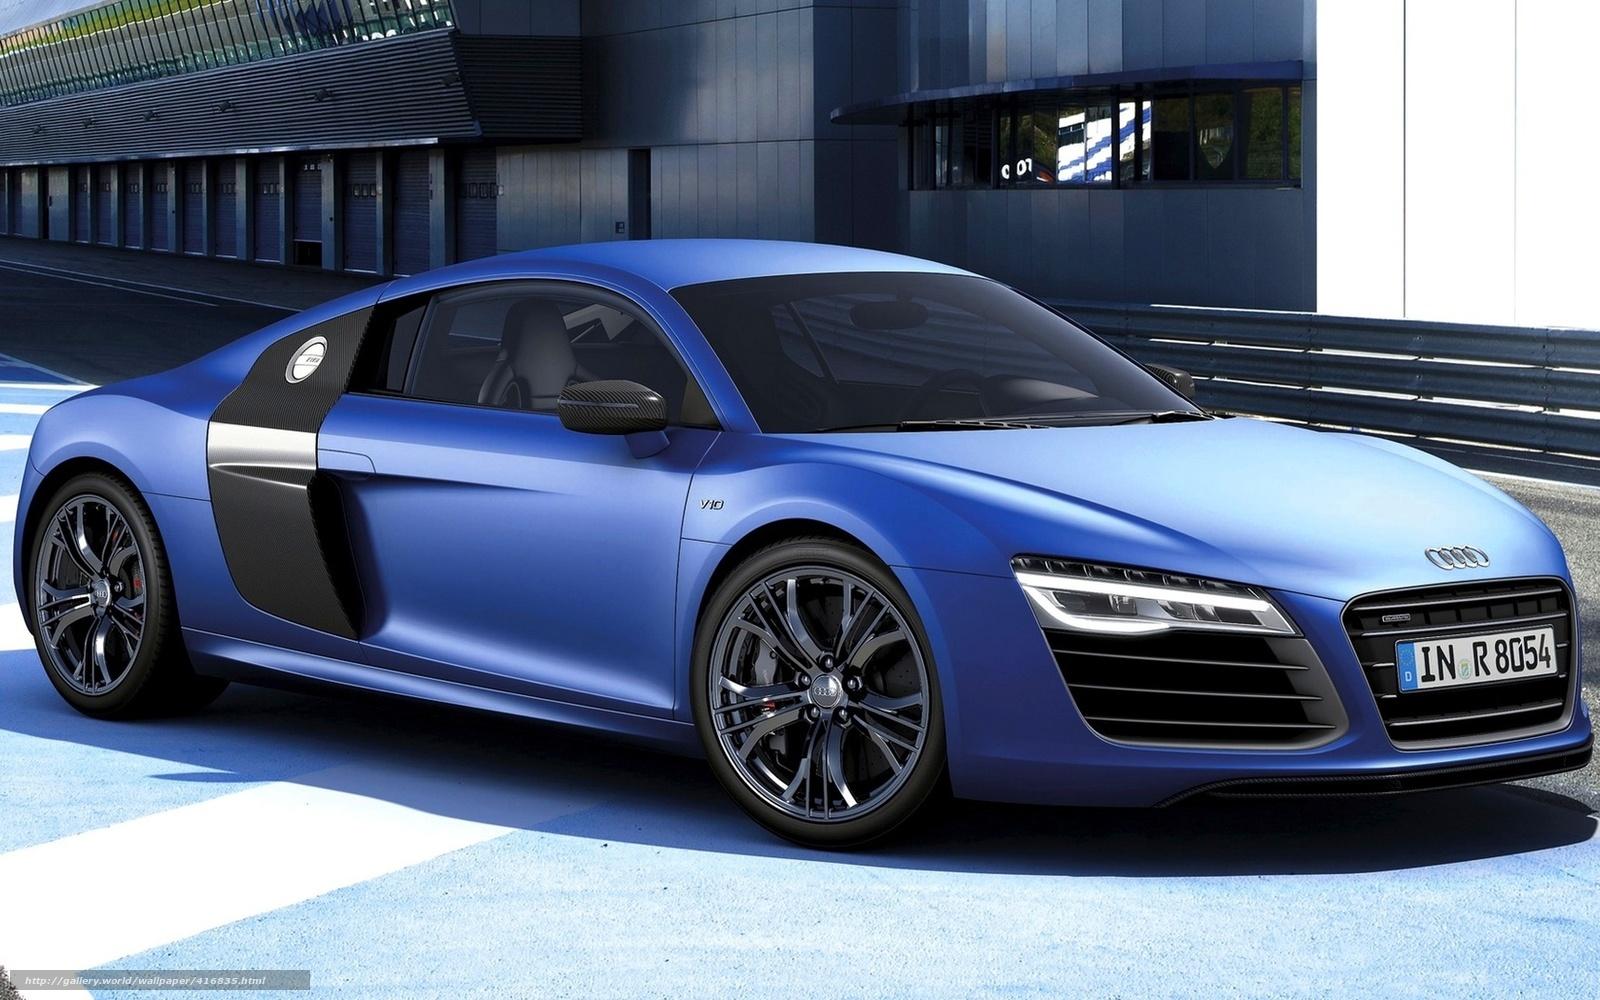 Tlcharger Fond D Ecran Voiture Papier Peint Bleu Audi